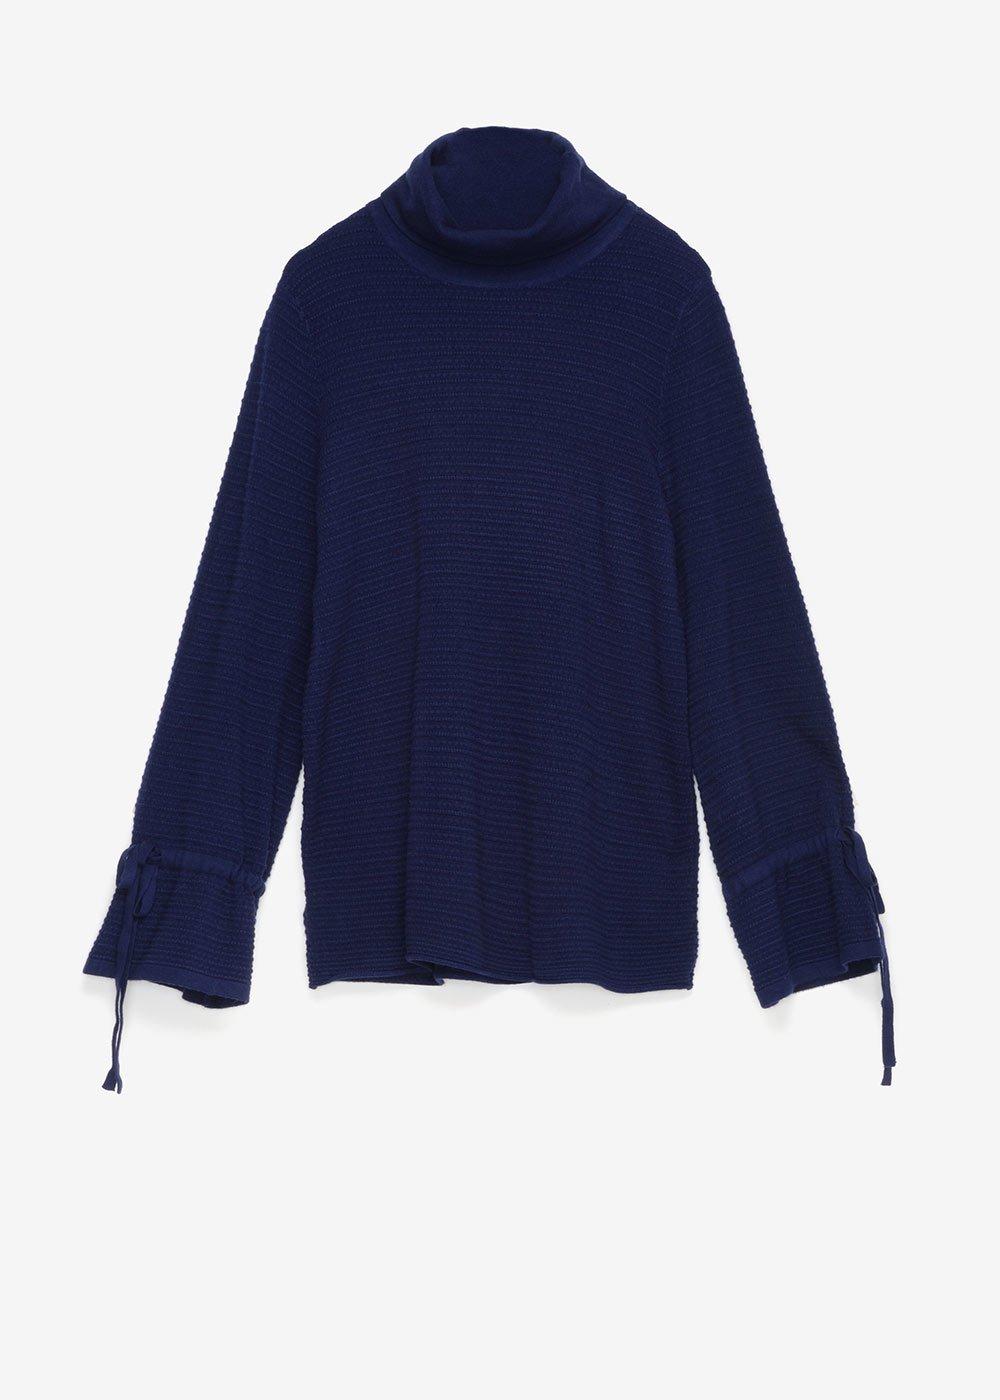 Moniq sweater with cowl neck - Ultramarine - Woman